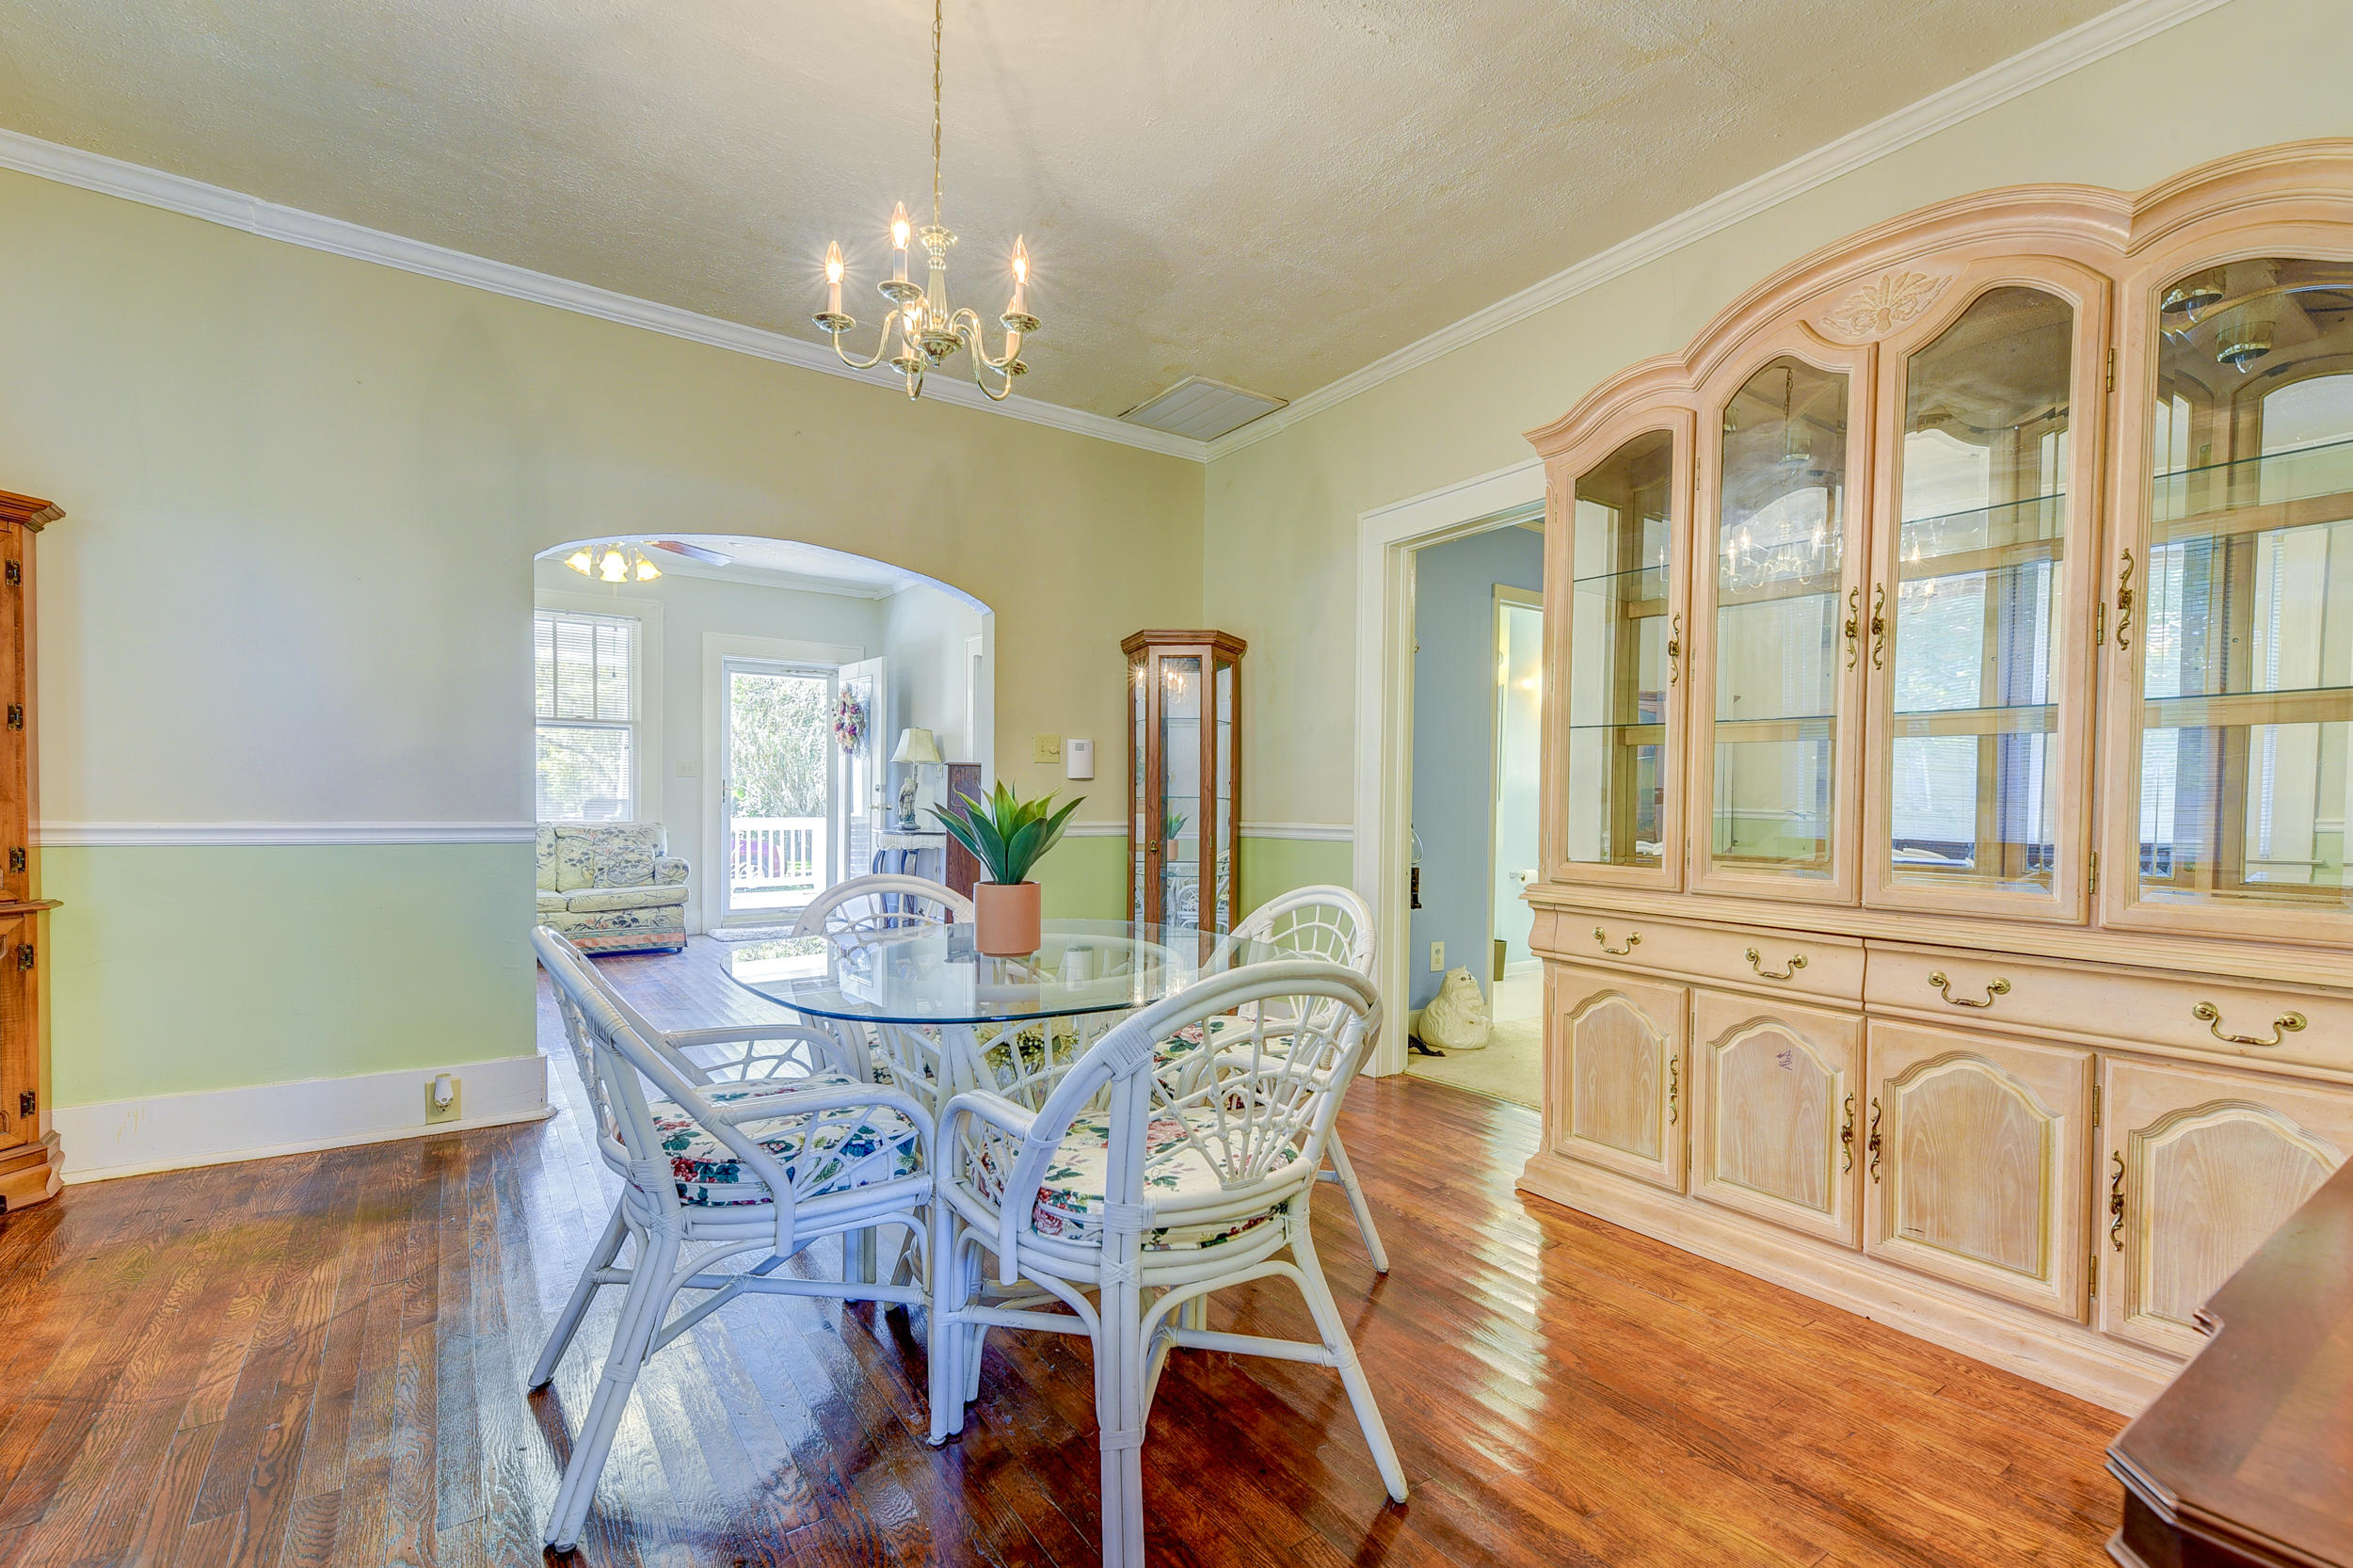 St Andrews Homes For Sale - 1908 2nd, Charleston, SC - 17